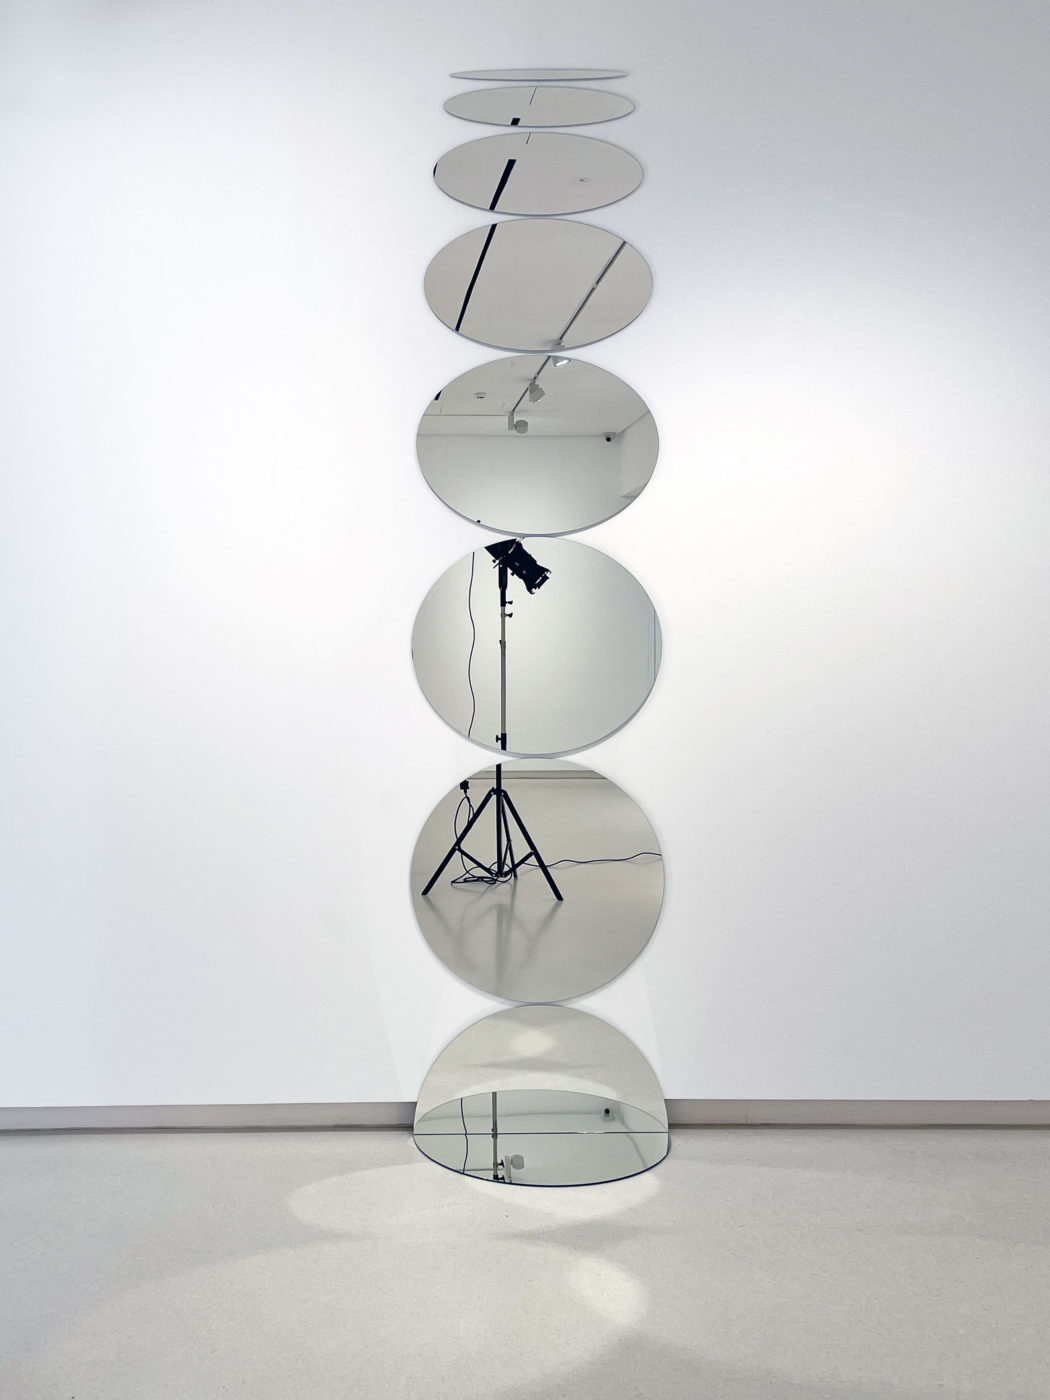 Escultura de Olafur Eliasson Eight circle rotation, 2008. 8 espejos, aluminio y goma